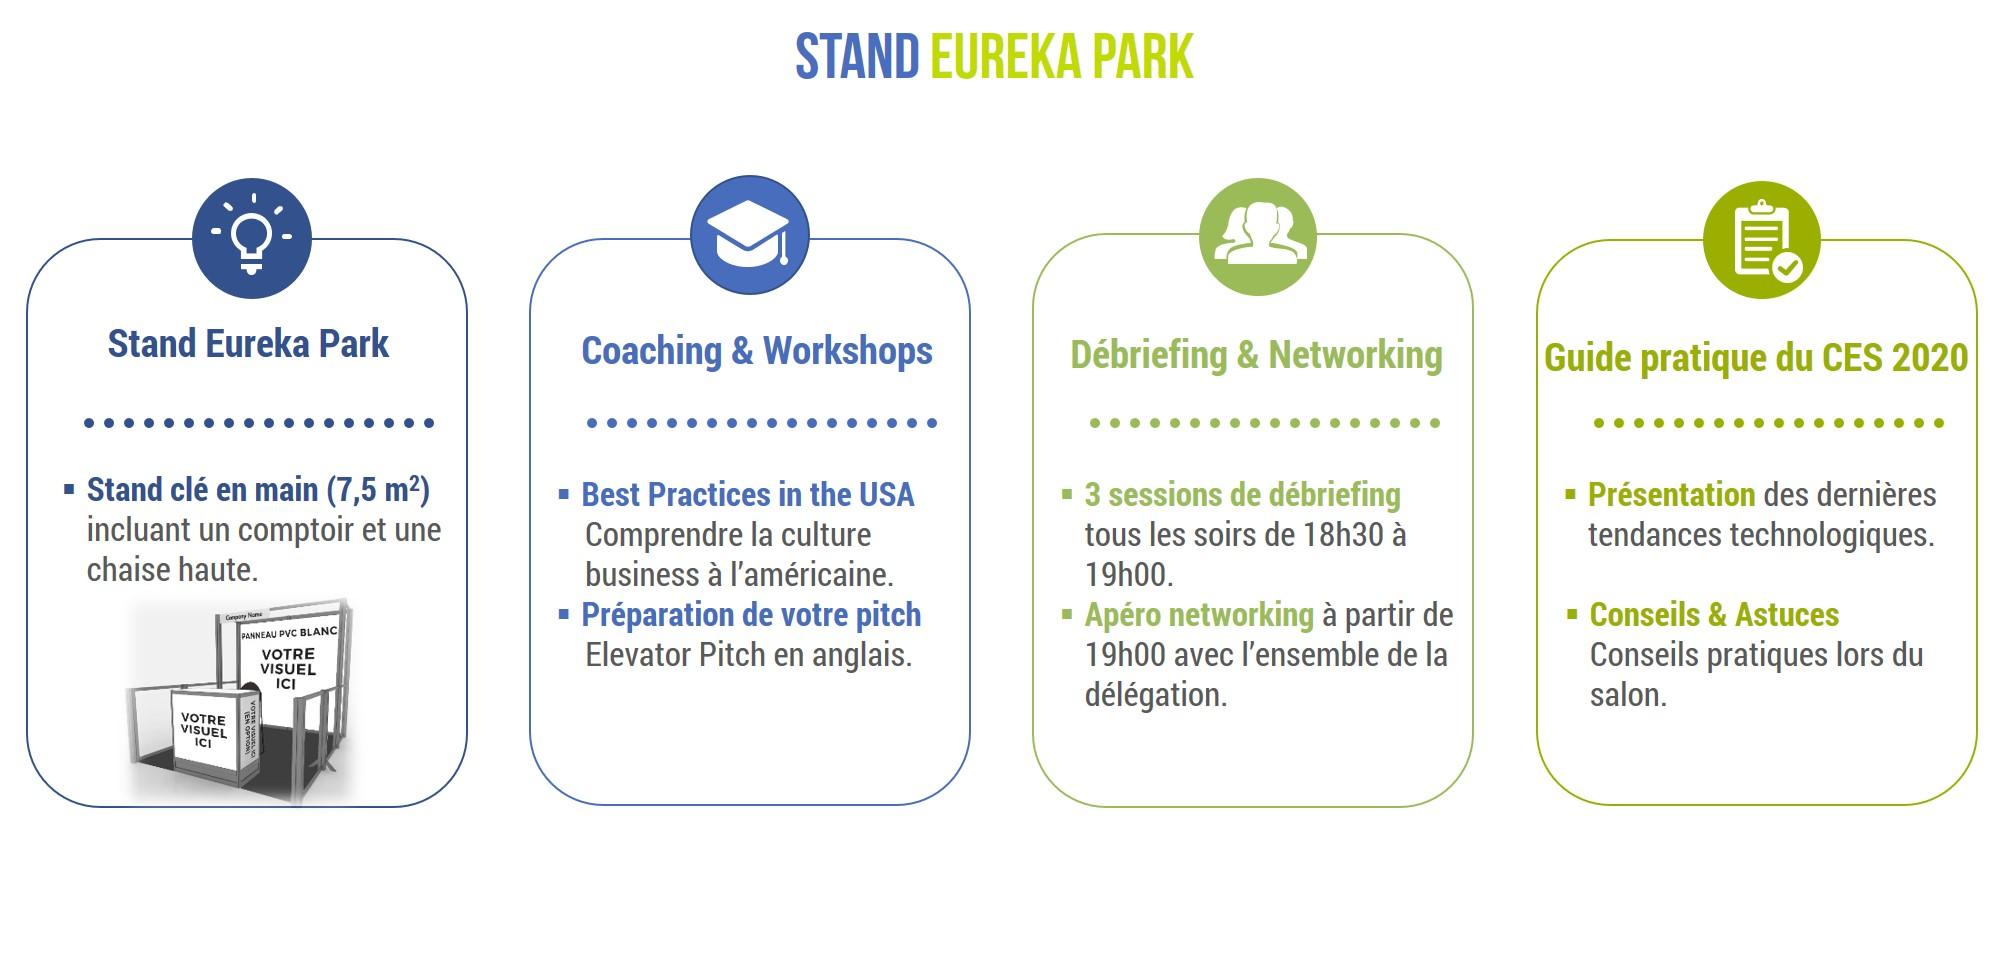 Stand Eureka Park